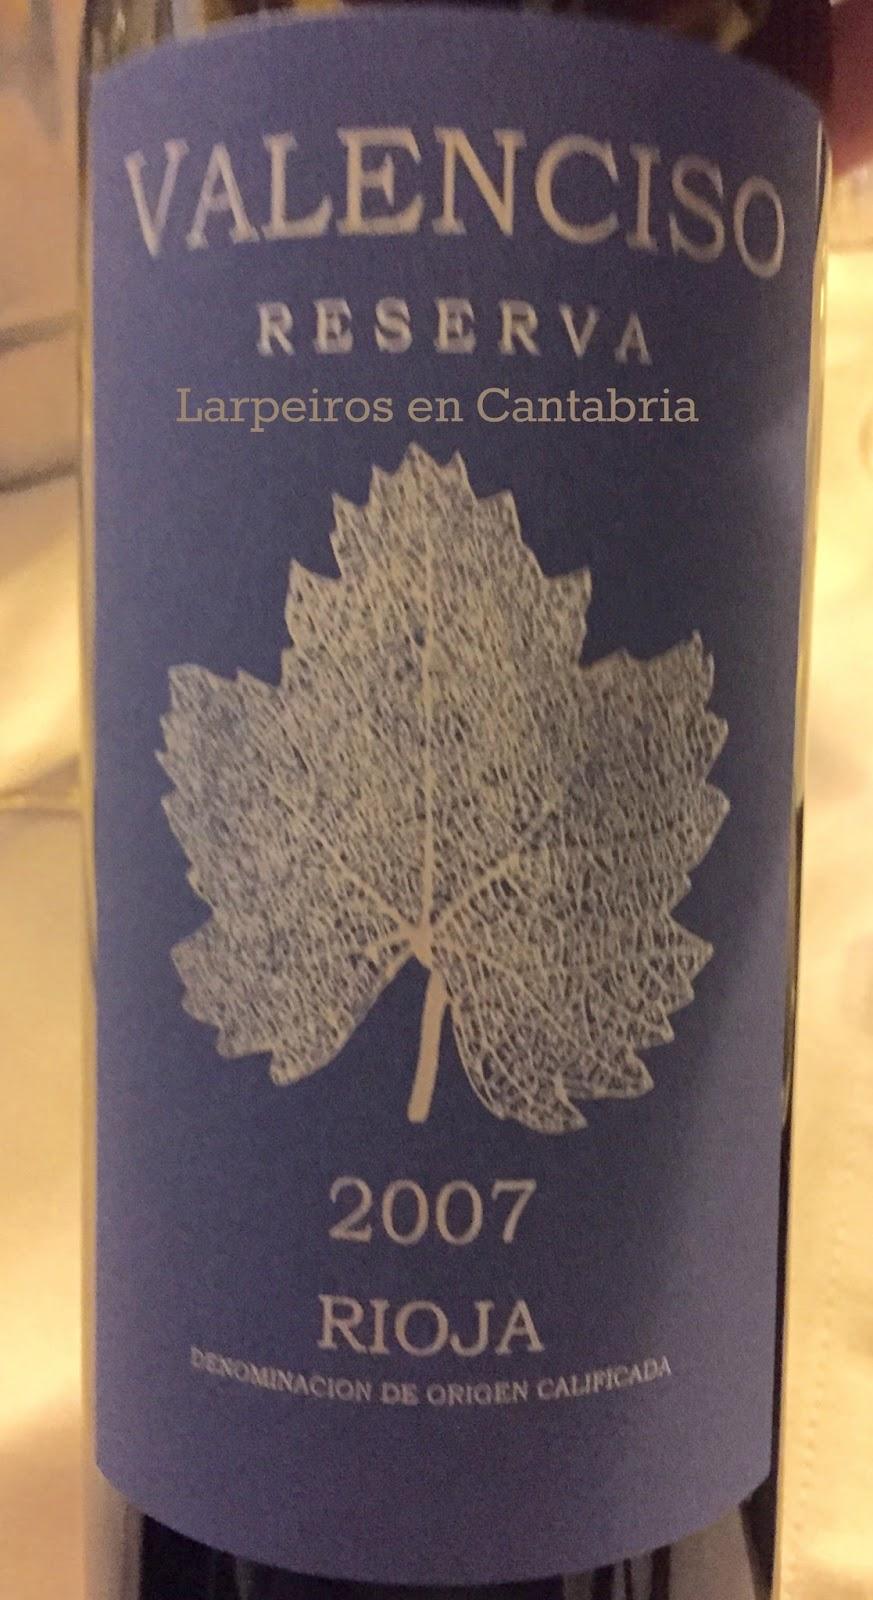 Vino Tinto Valencisco Reserva 2007: Sólo Reservas, Solo de Rioja